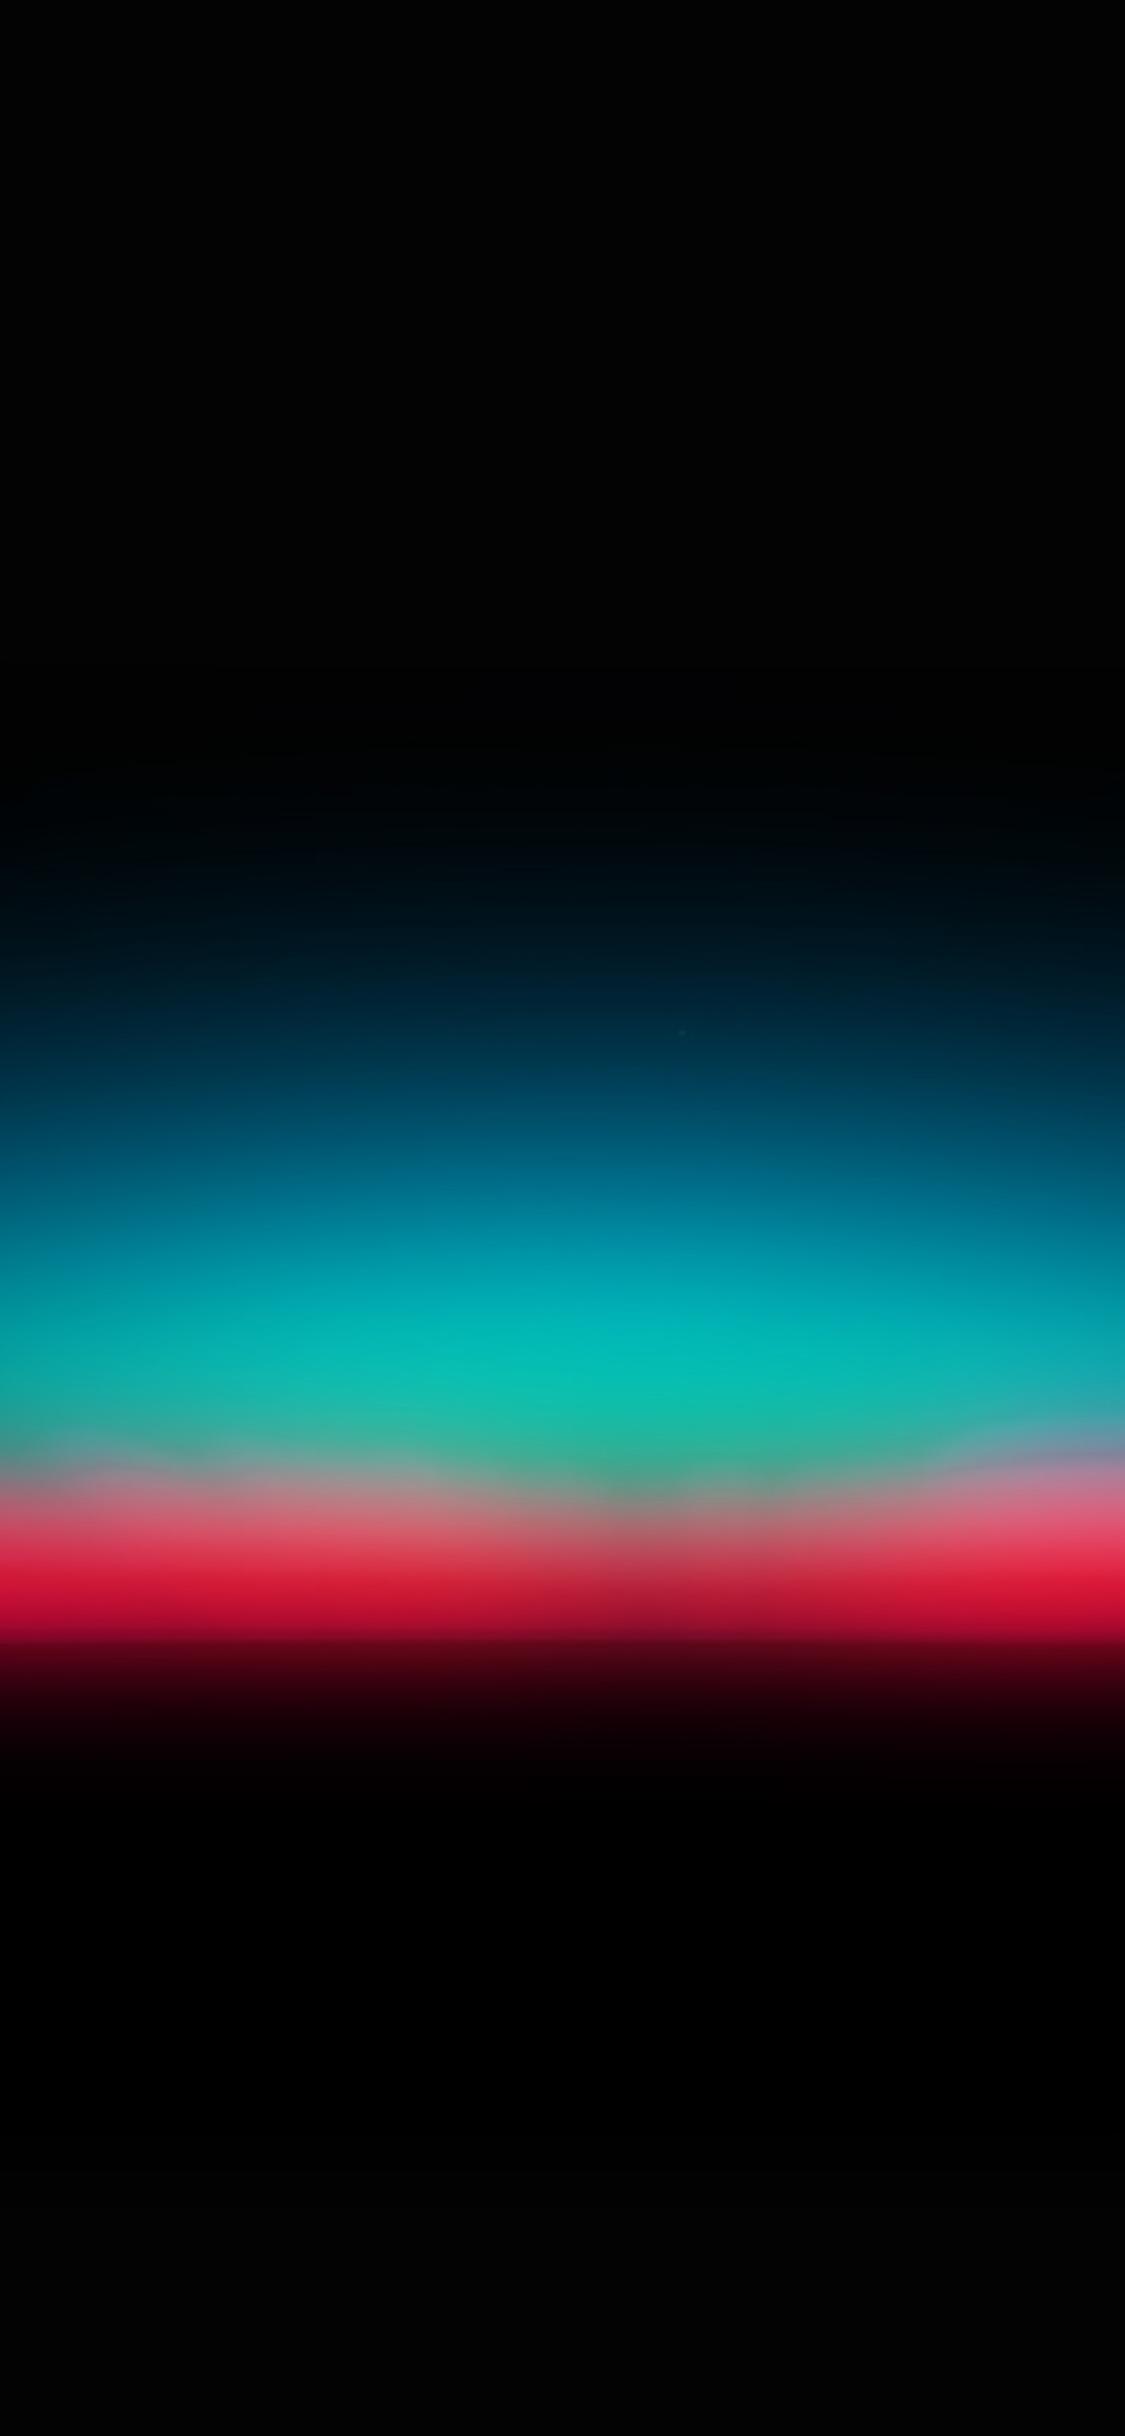 iPhoneXpapers.com-Apple-iPhone-wallpaper-sk36-sunset-dark-red-green-horizontal-blur-gradation